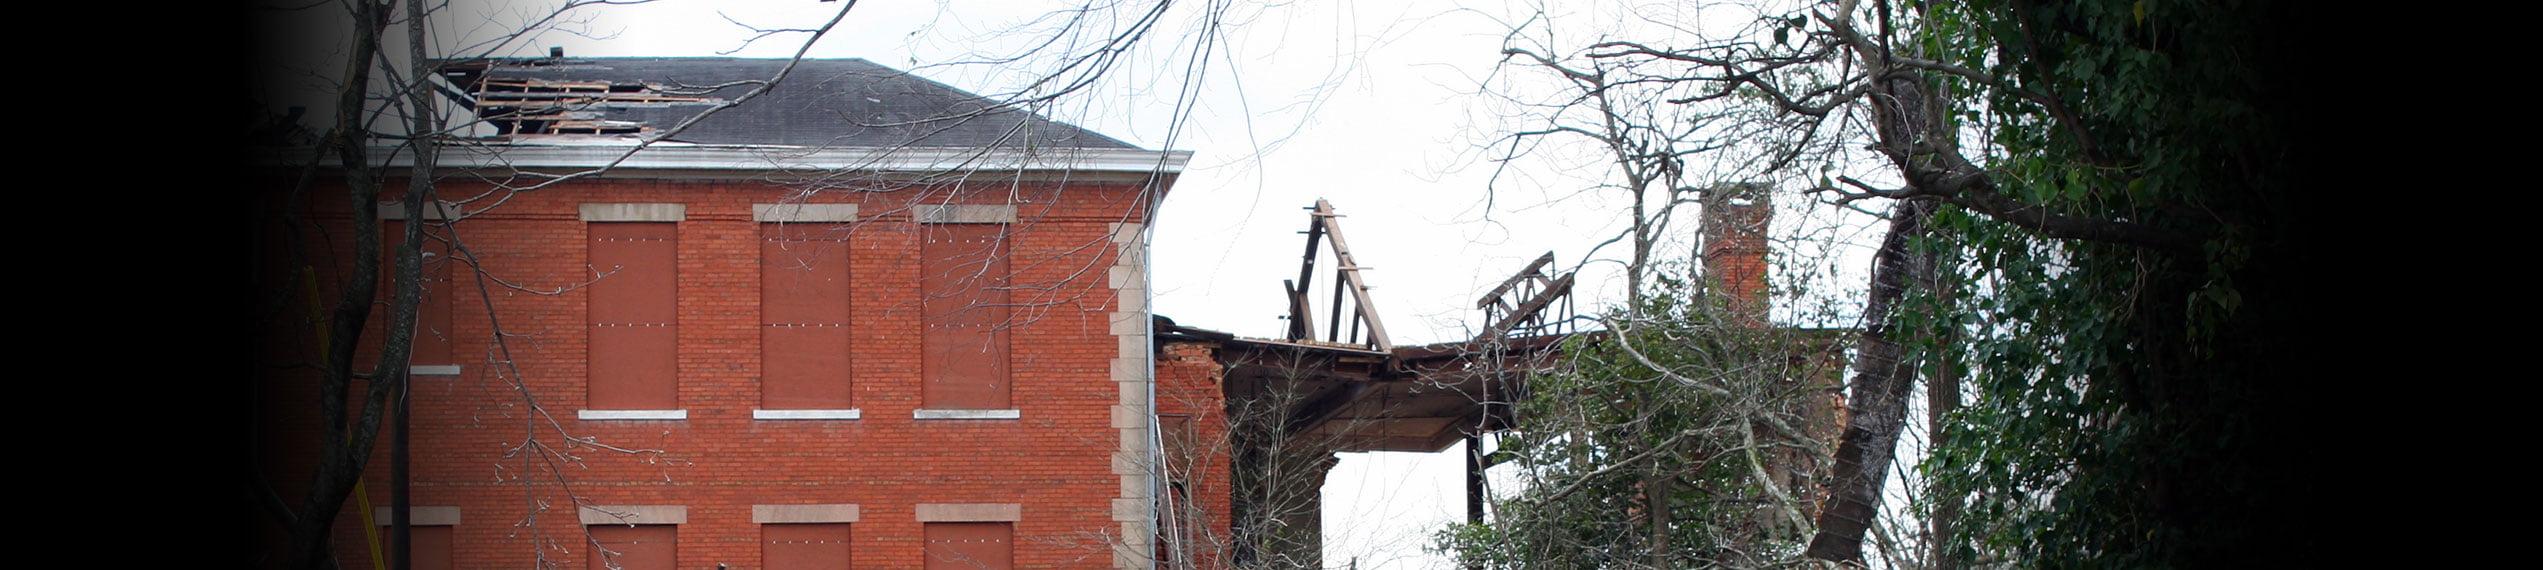 Wind & Storm Damage Repairs in Paul Davis Emergency Services of Terre Haute, IN